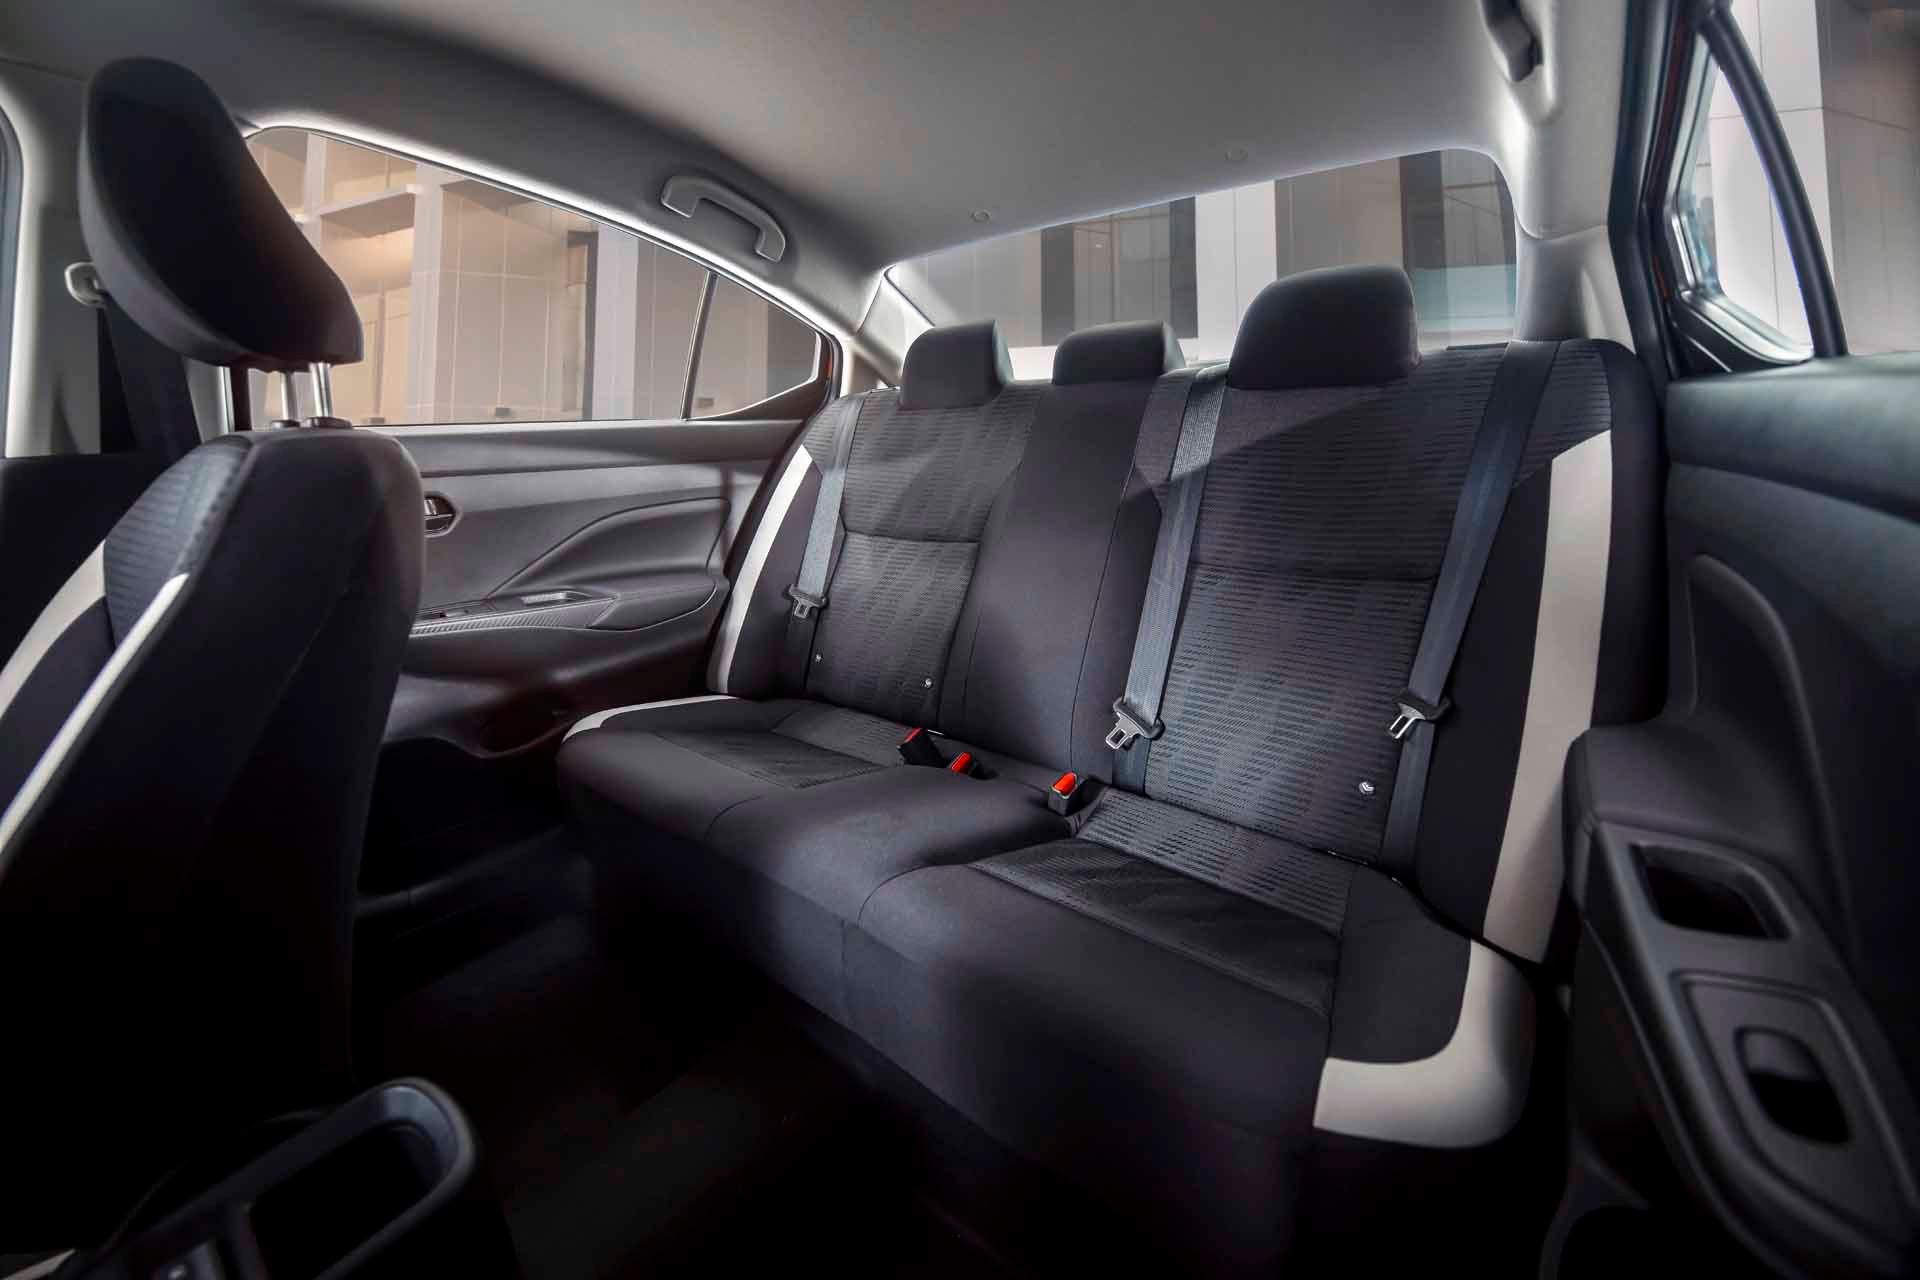 Hàng ghế sau của xe Nissan Almera